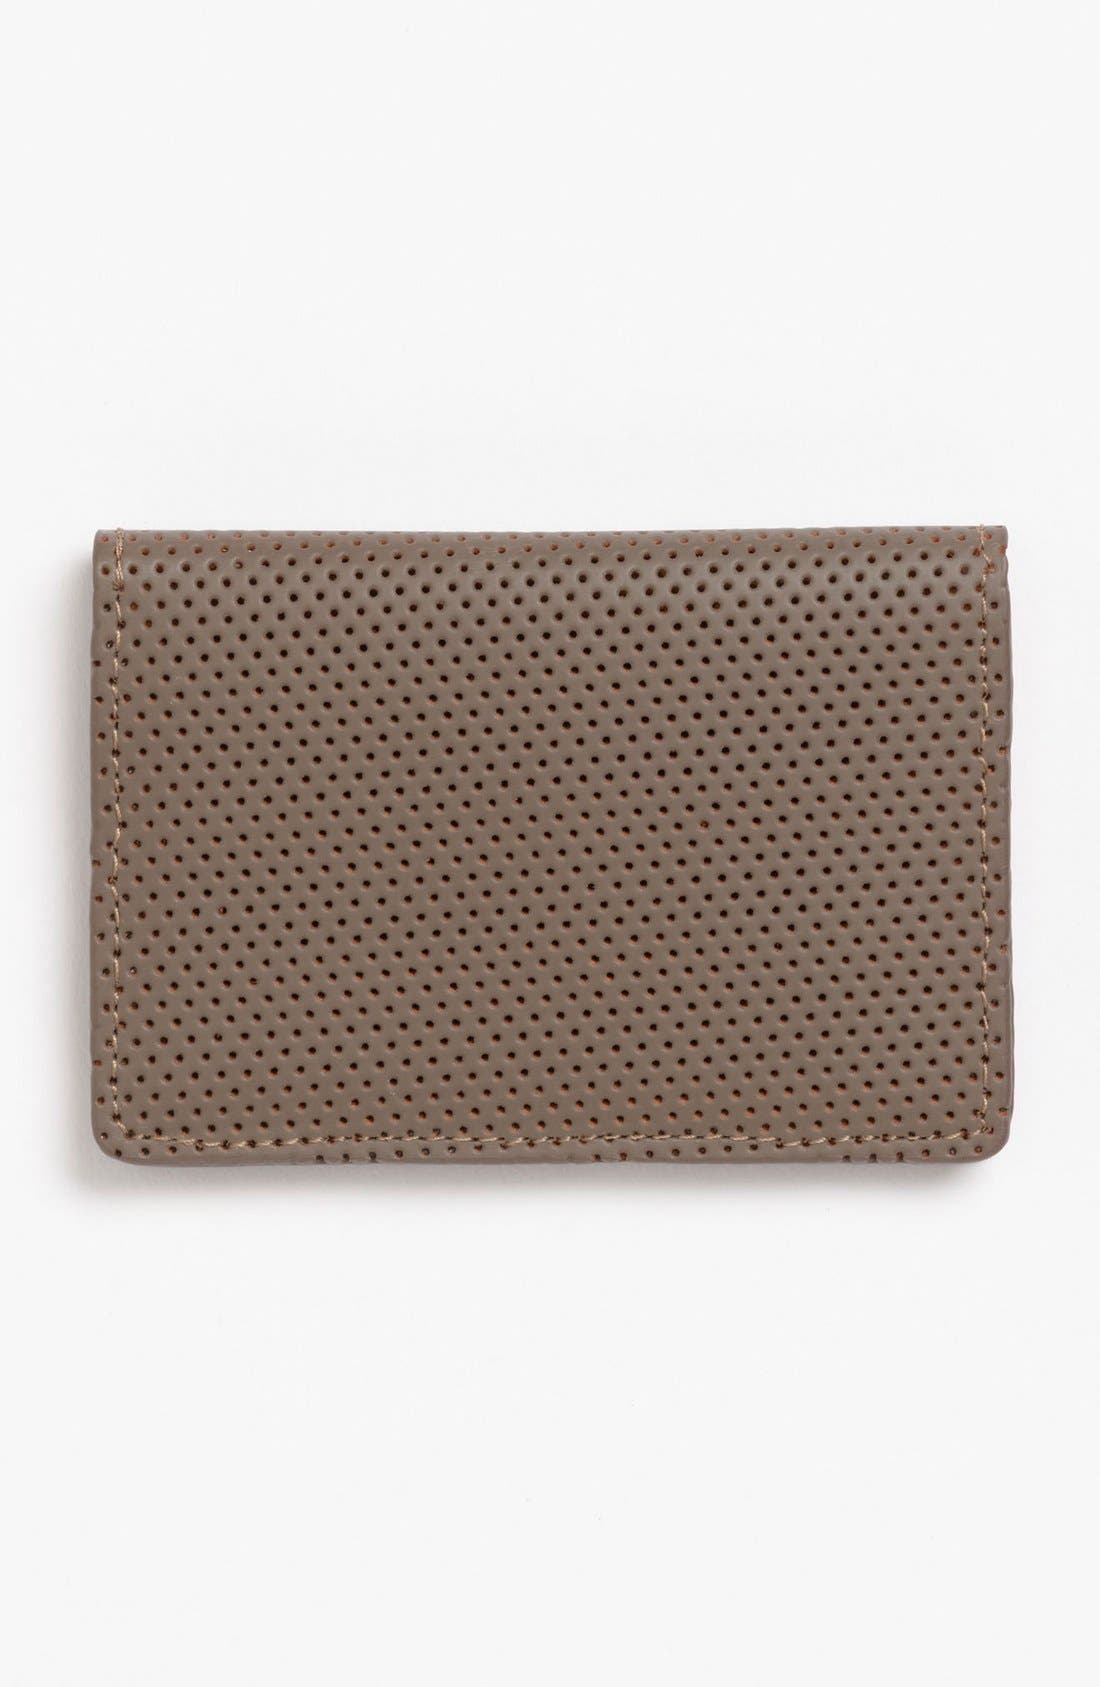 Main Image - J Fold 'Microperf' Folding Card Holder